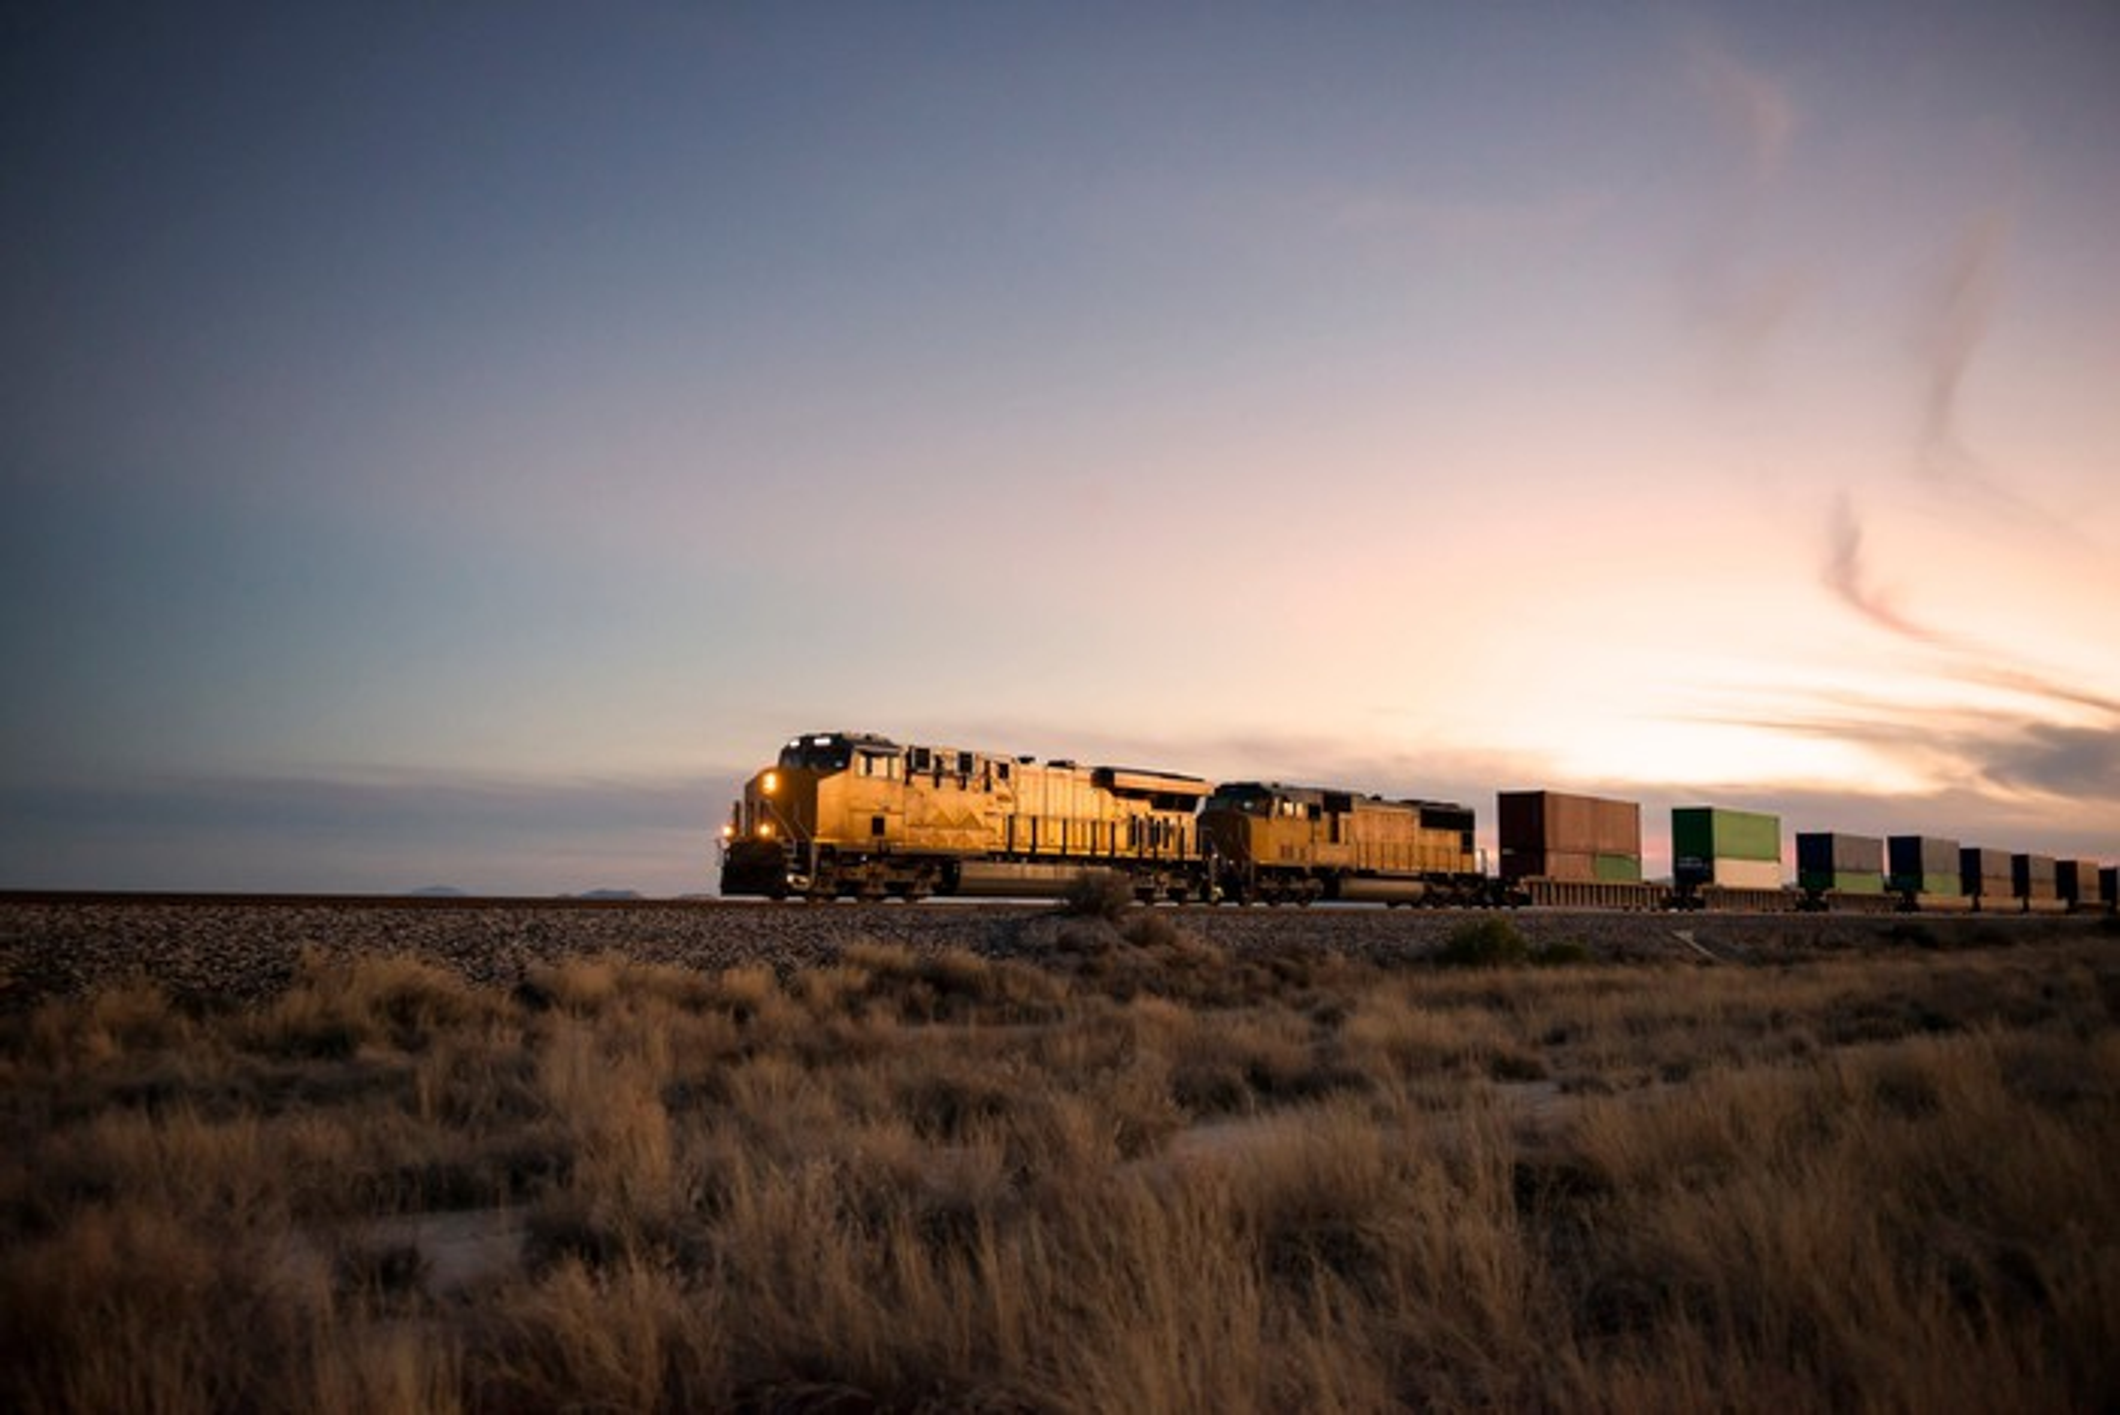 A cargo train travelling through the plains.